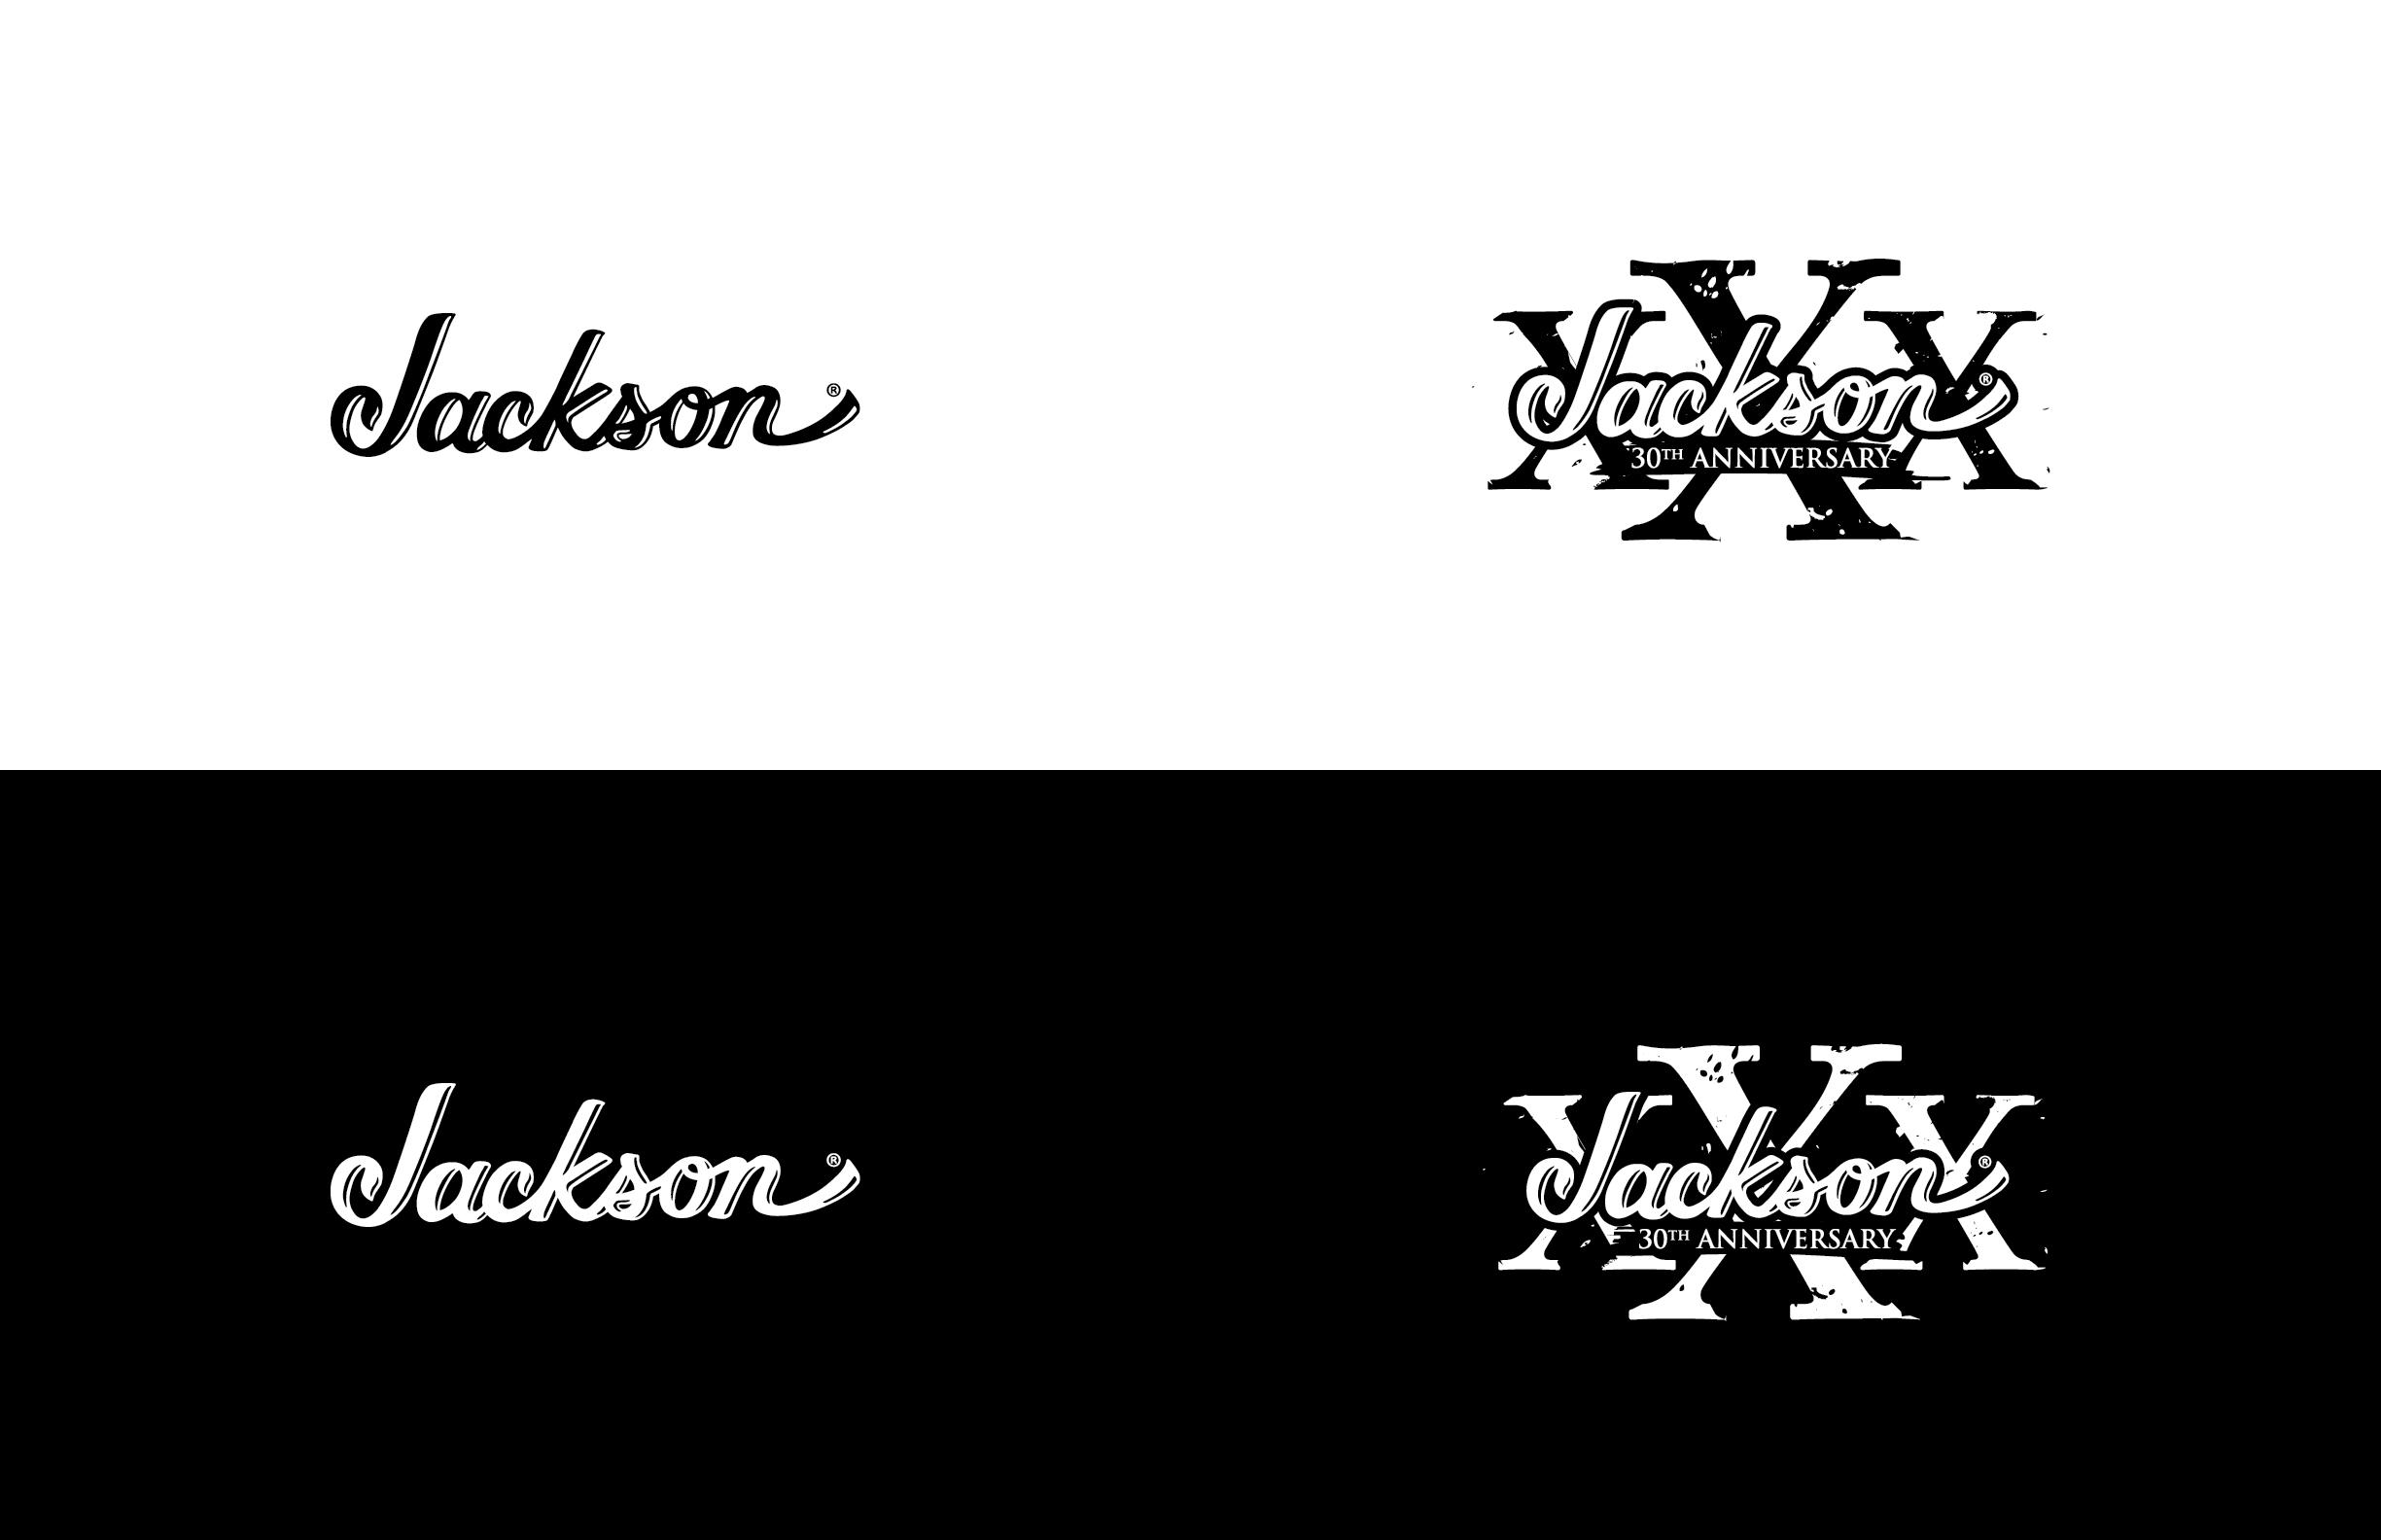 jackson-30th-logo@2x.png